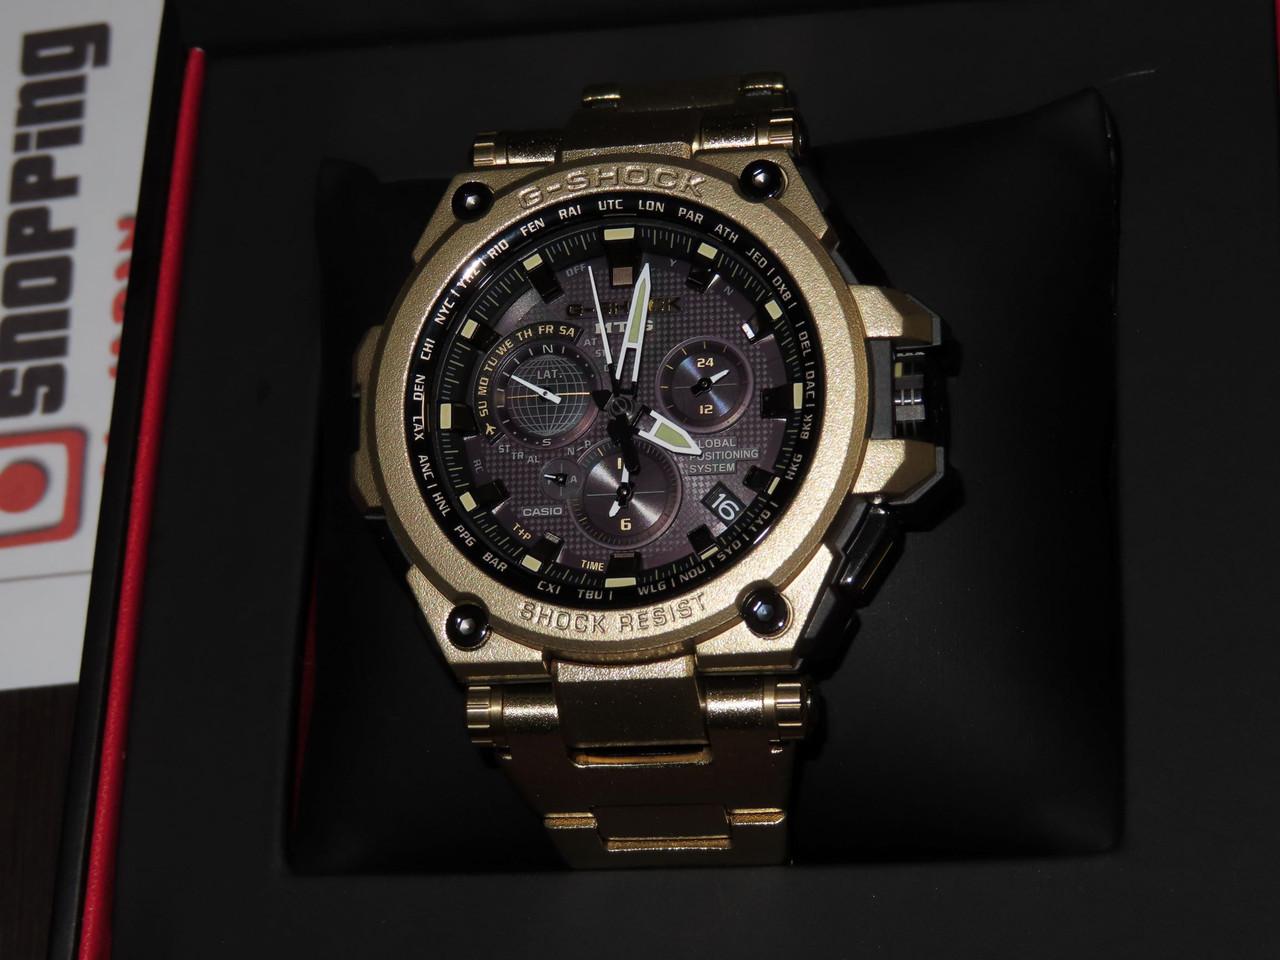 G-Shock MTG-G1000RG-1AJR Gold IP Limited Edition